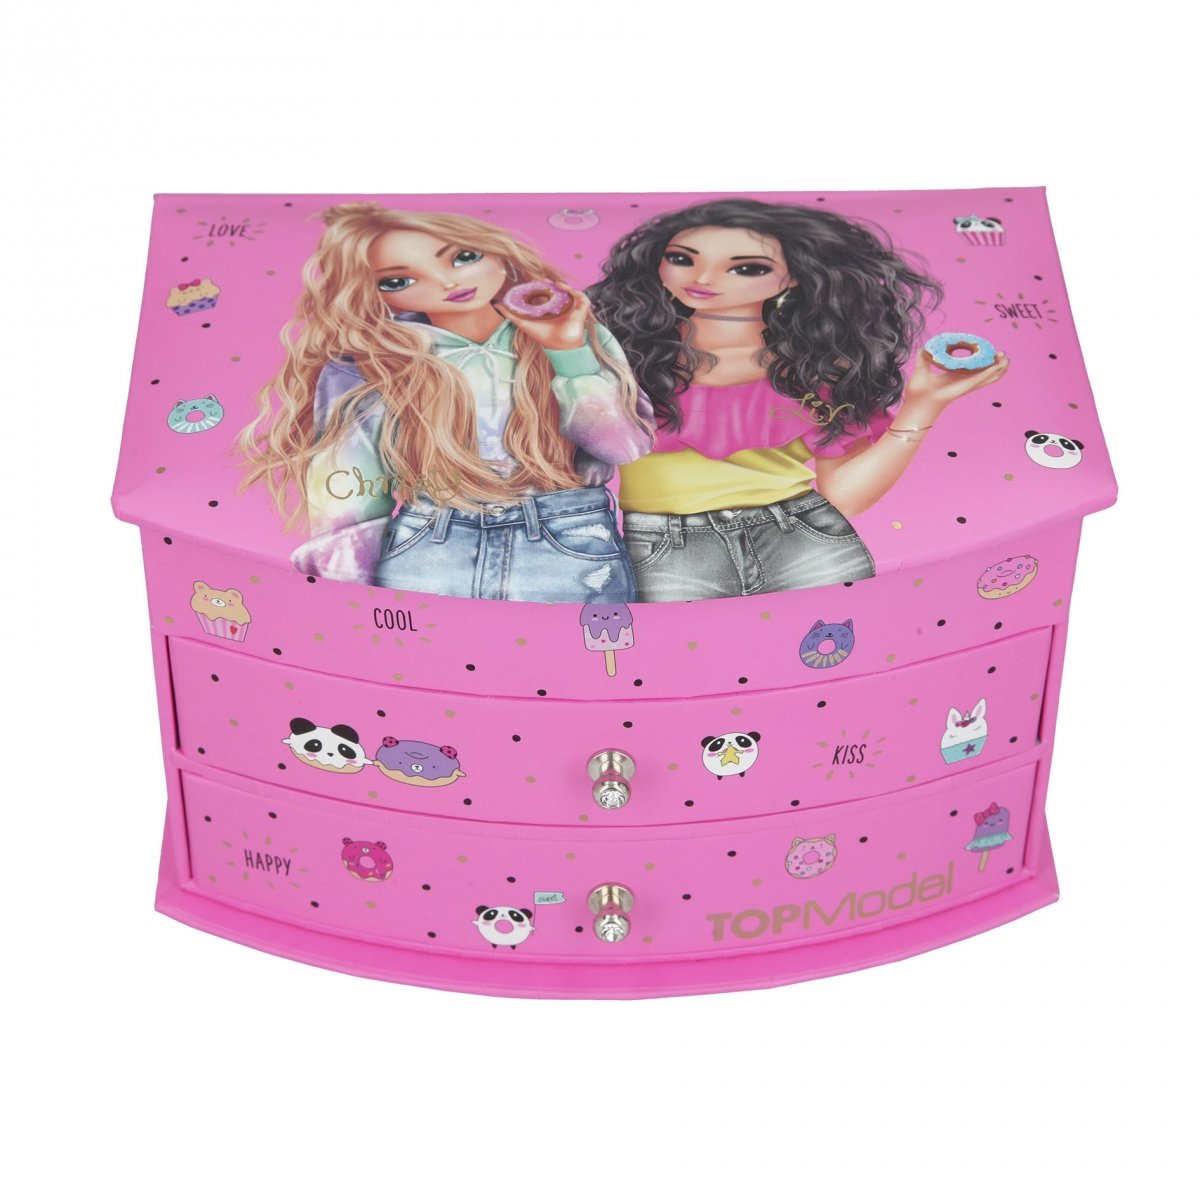 Top Model - Jewlery Case - Pink (0411235)